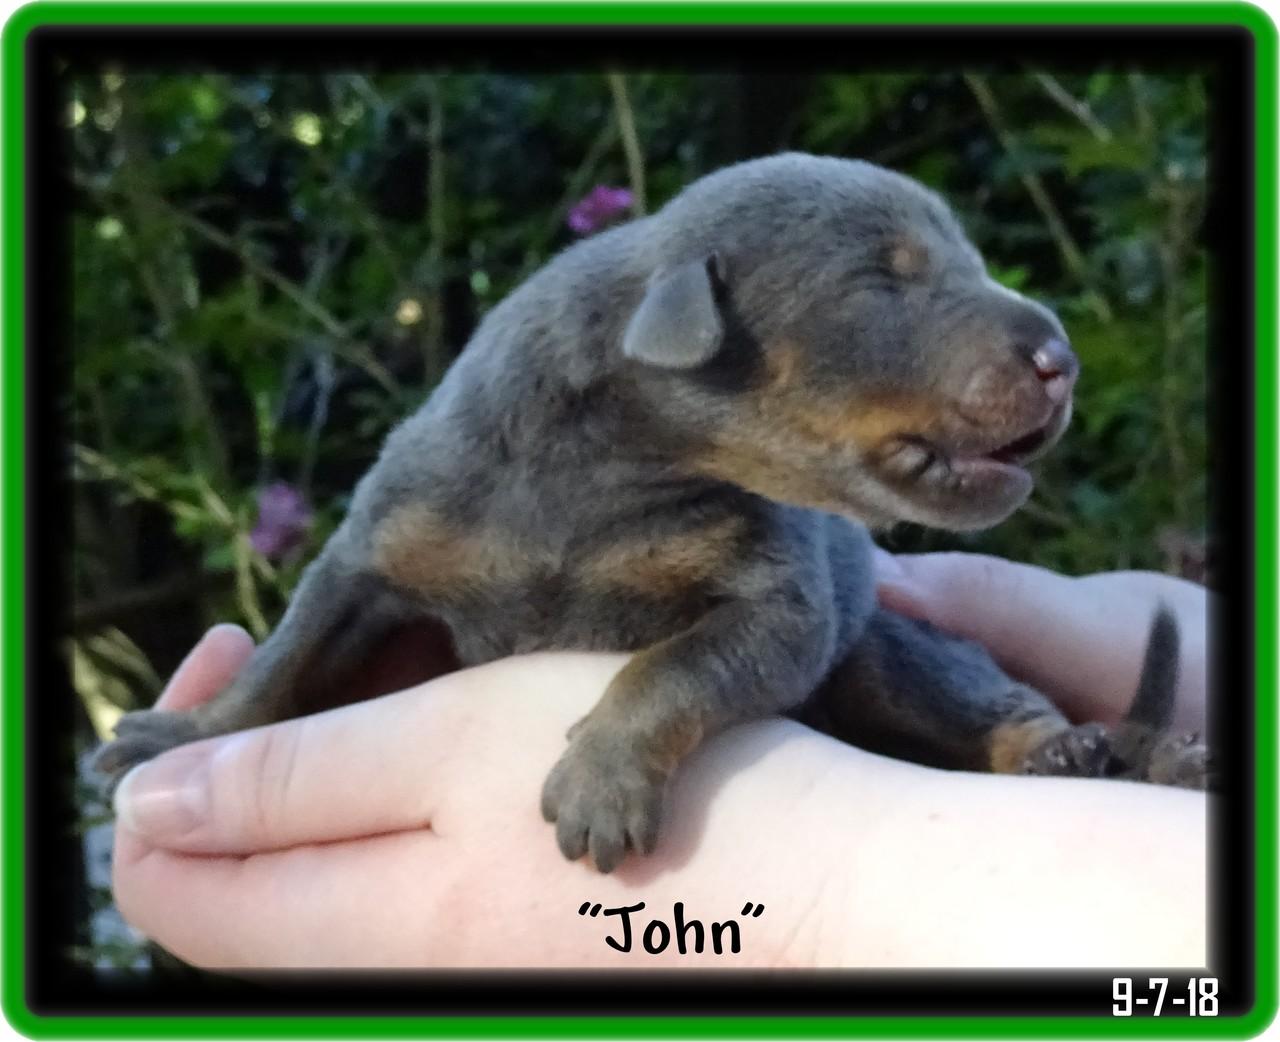 Jon - Zoey and Max boy ... born 10-3-18  in training  / Charleston SC